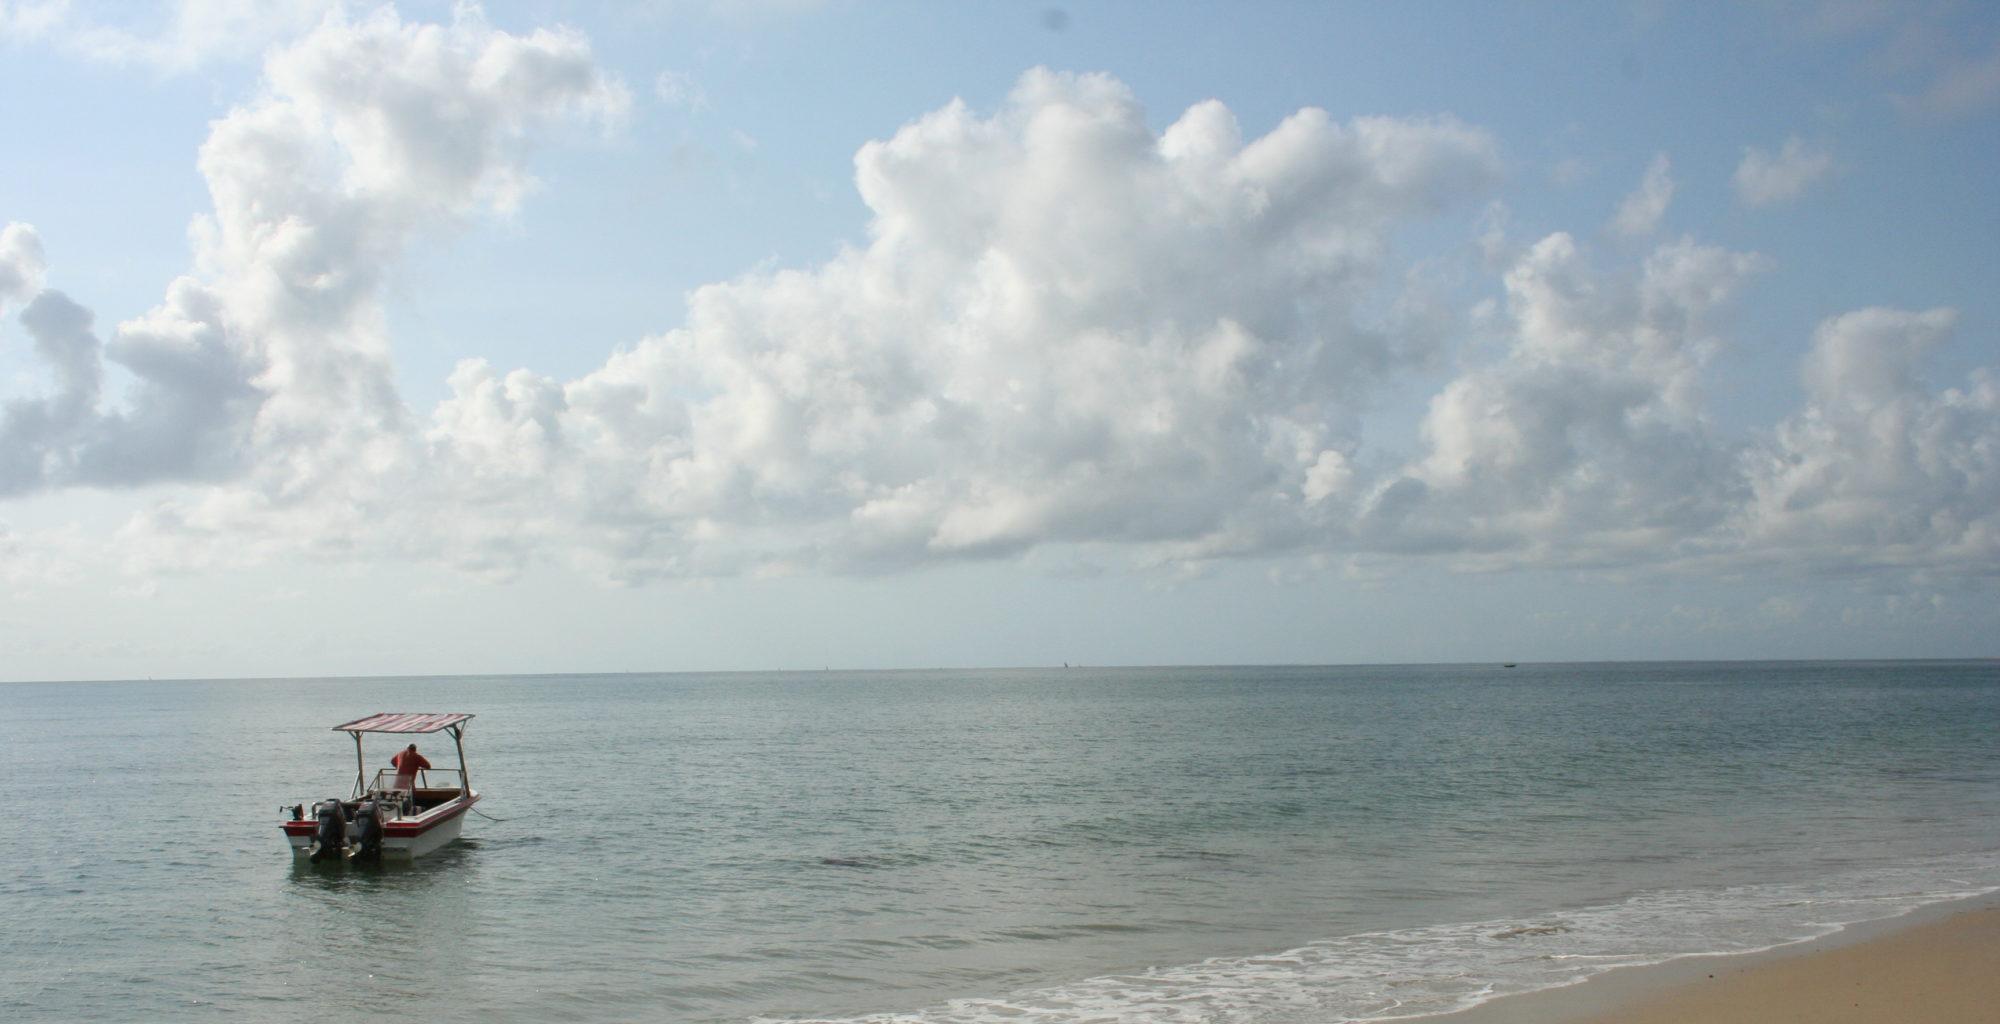 Tanzania-Mainland-Coast-Fishing